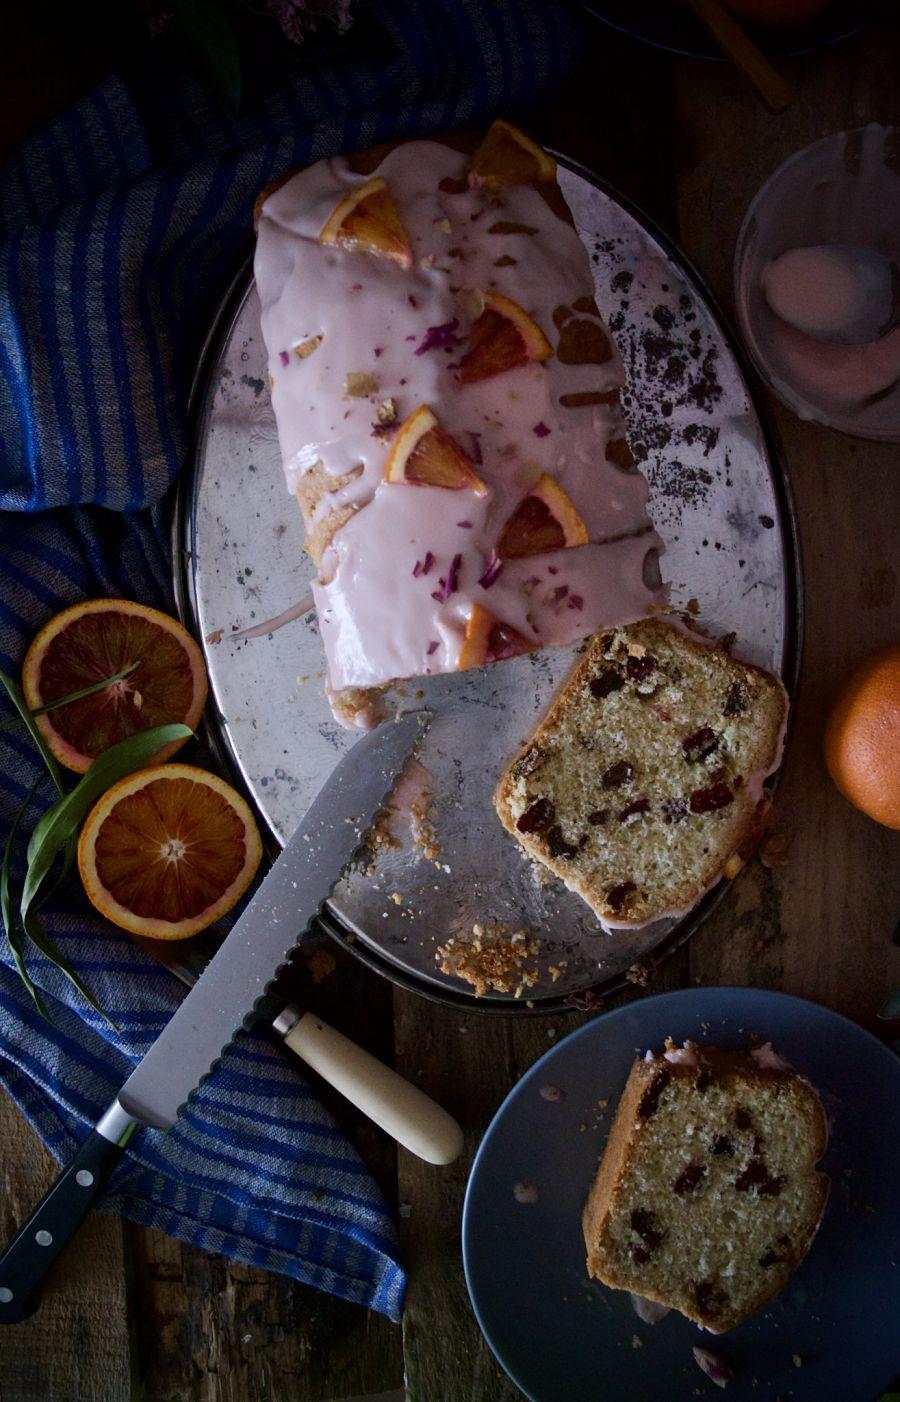 Plum cake ingles con glaseado de naranja sanguina